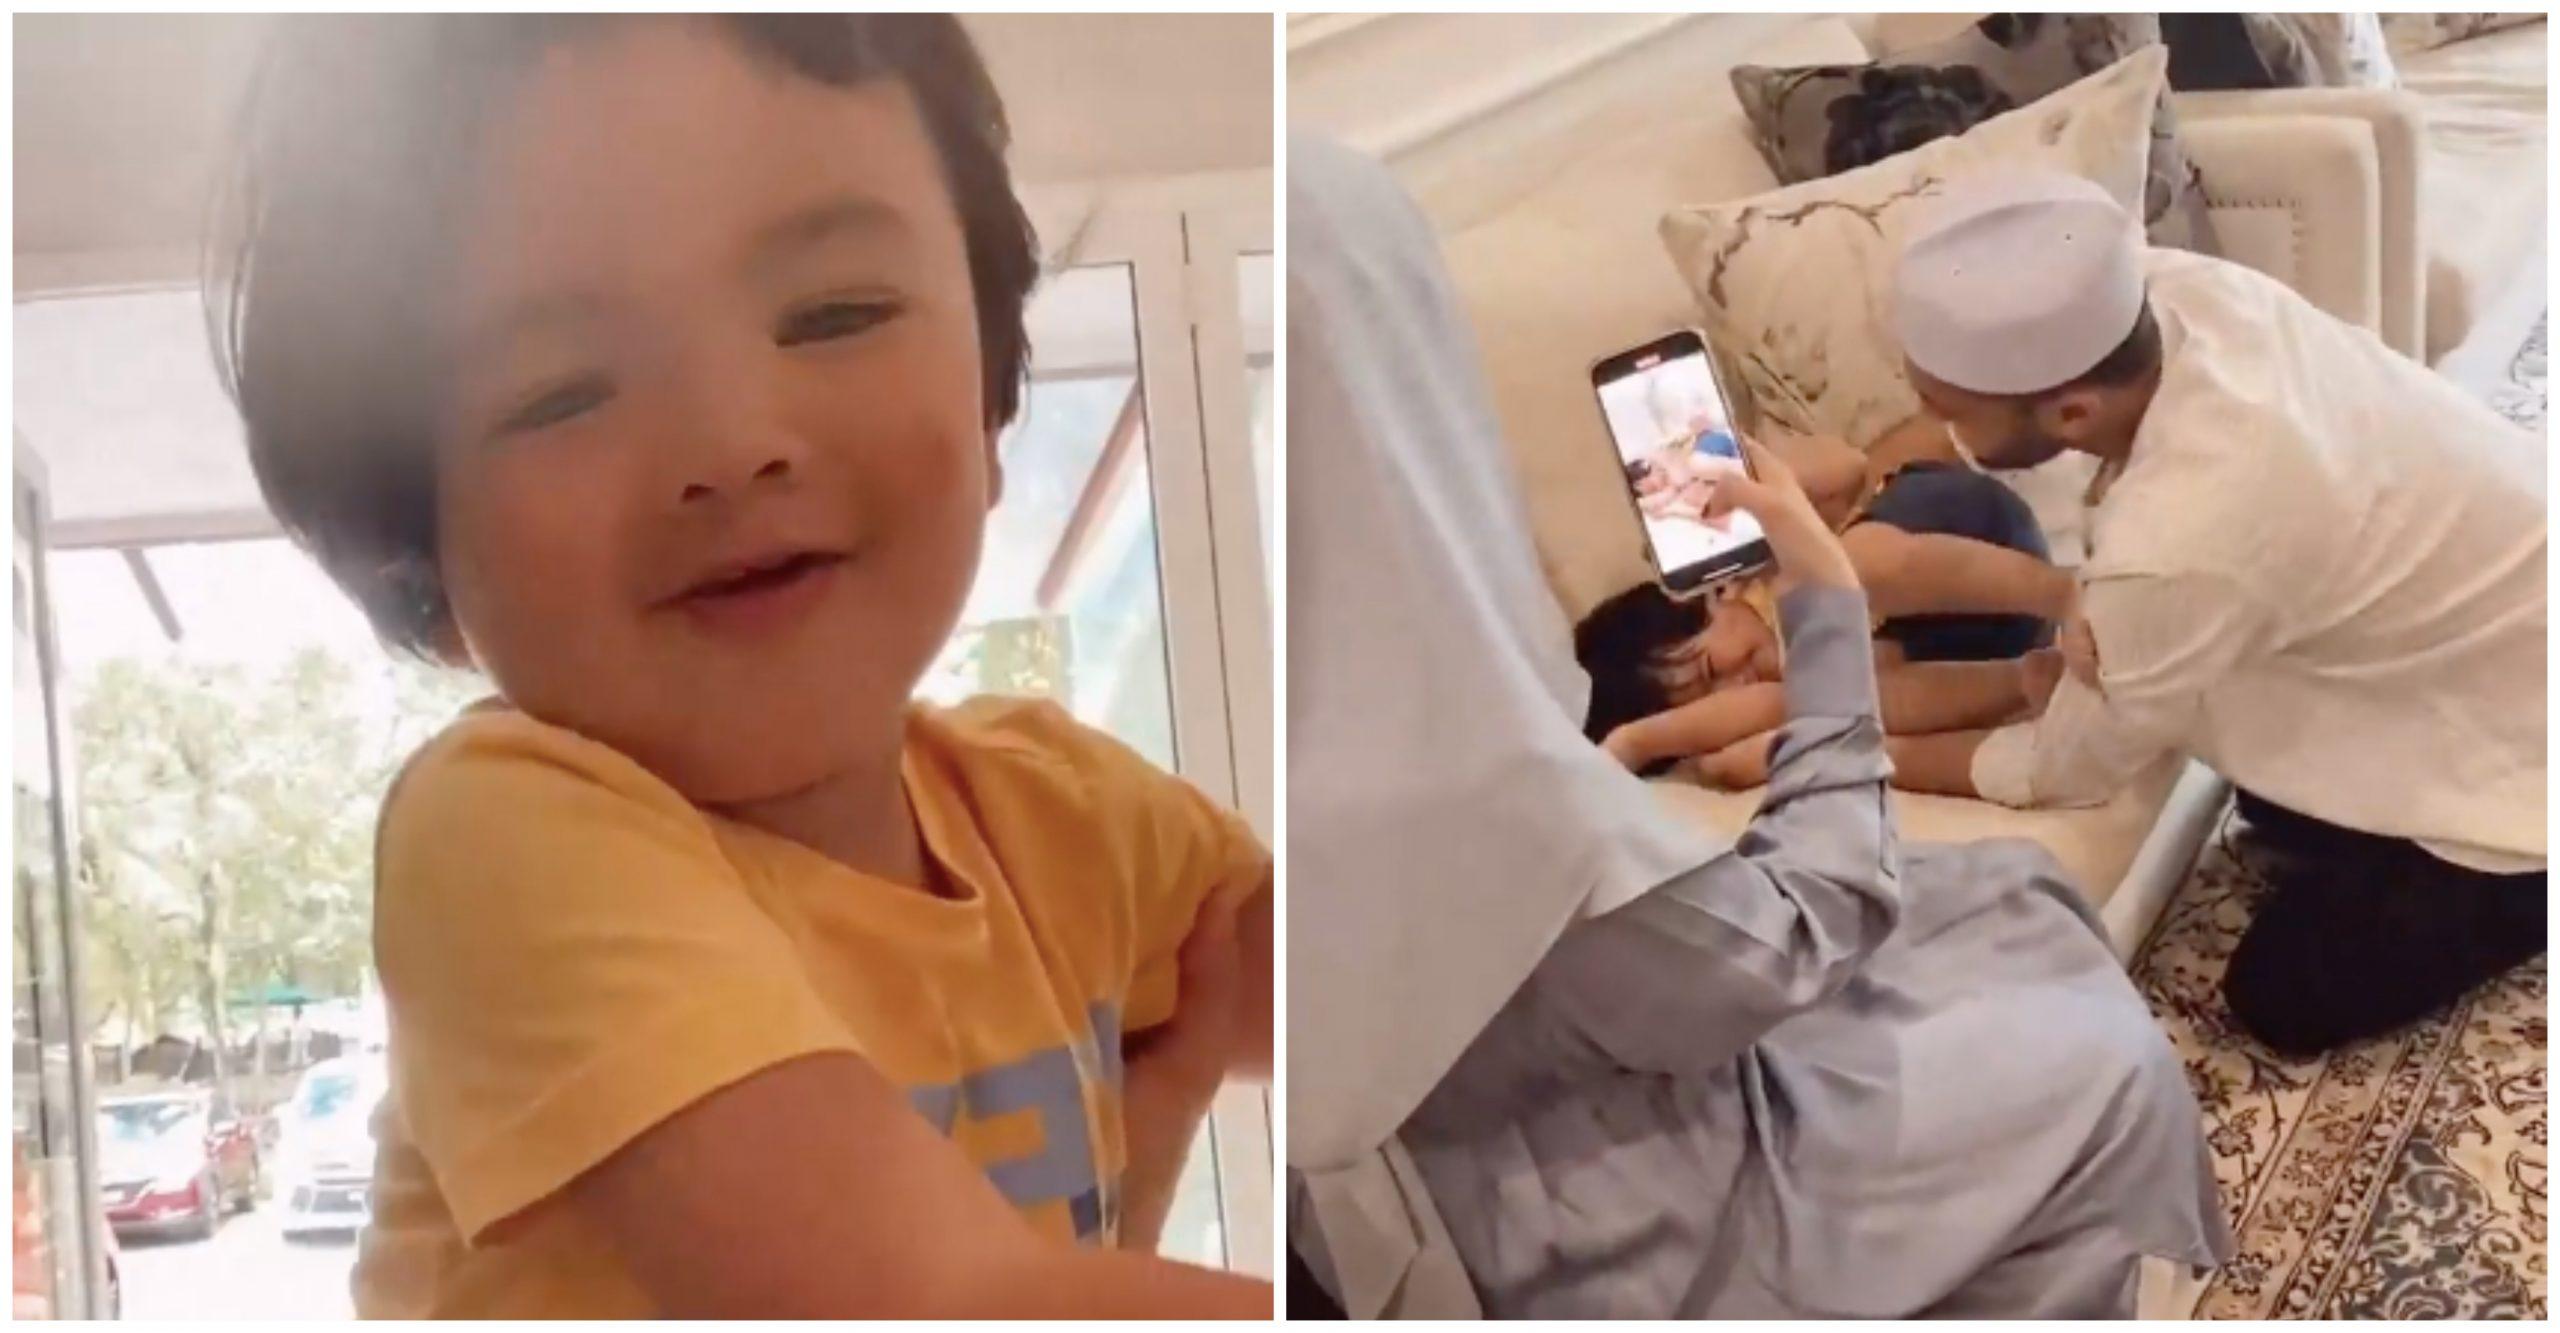 [VIDEO] Lepas 'Can Mali Can', Jebat Jayden Hadiahkan PU Riz Lagu Happy Birthday. Comel Sungguh! 1